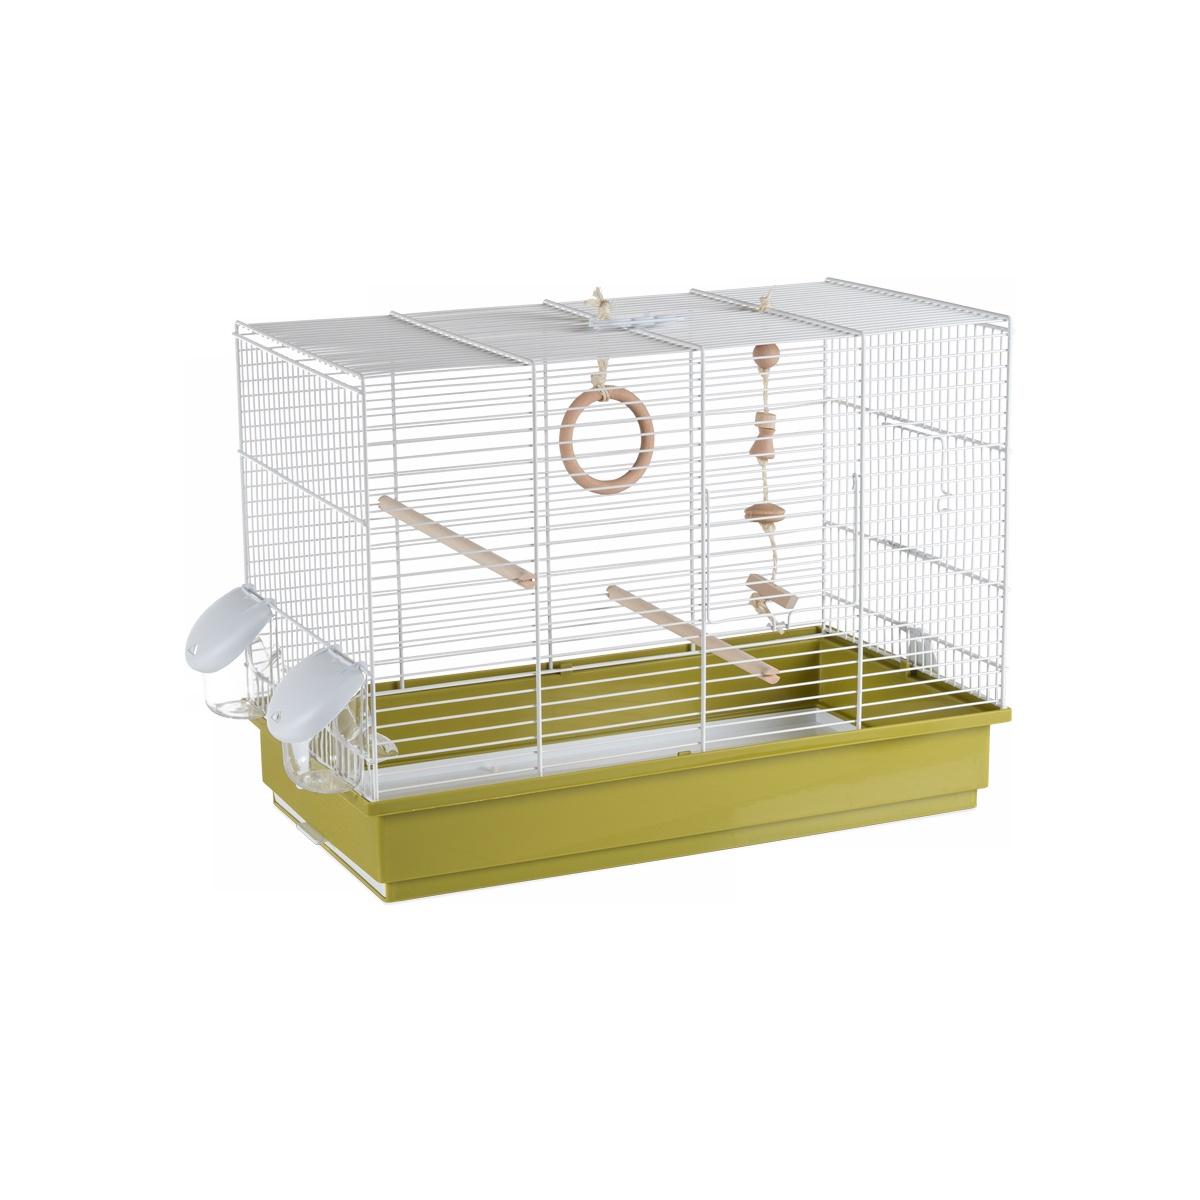 "Клетка для мелких птиц Voltrega (Испания) ""611"", 50.5х28х37.5см"